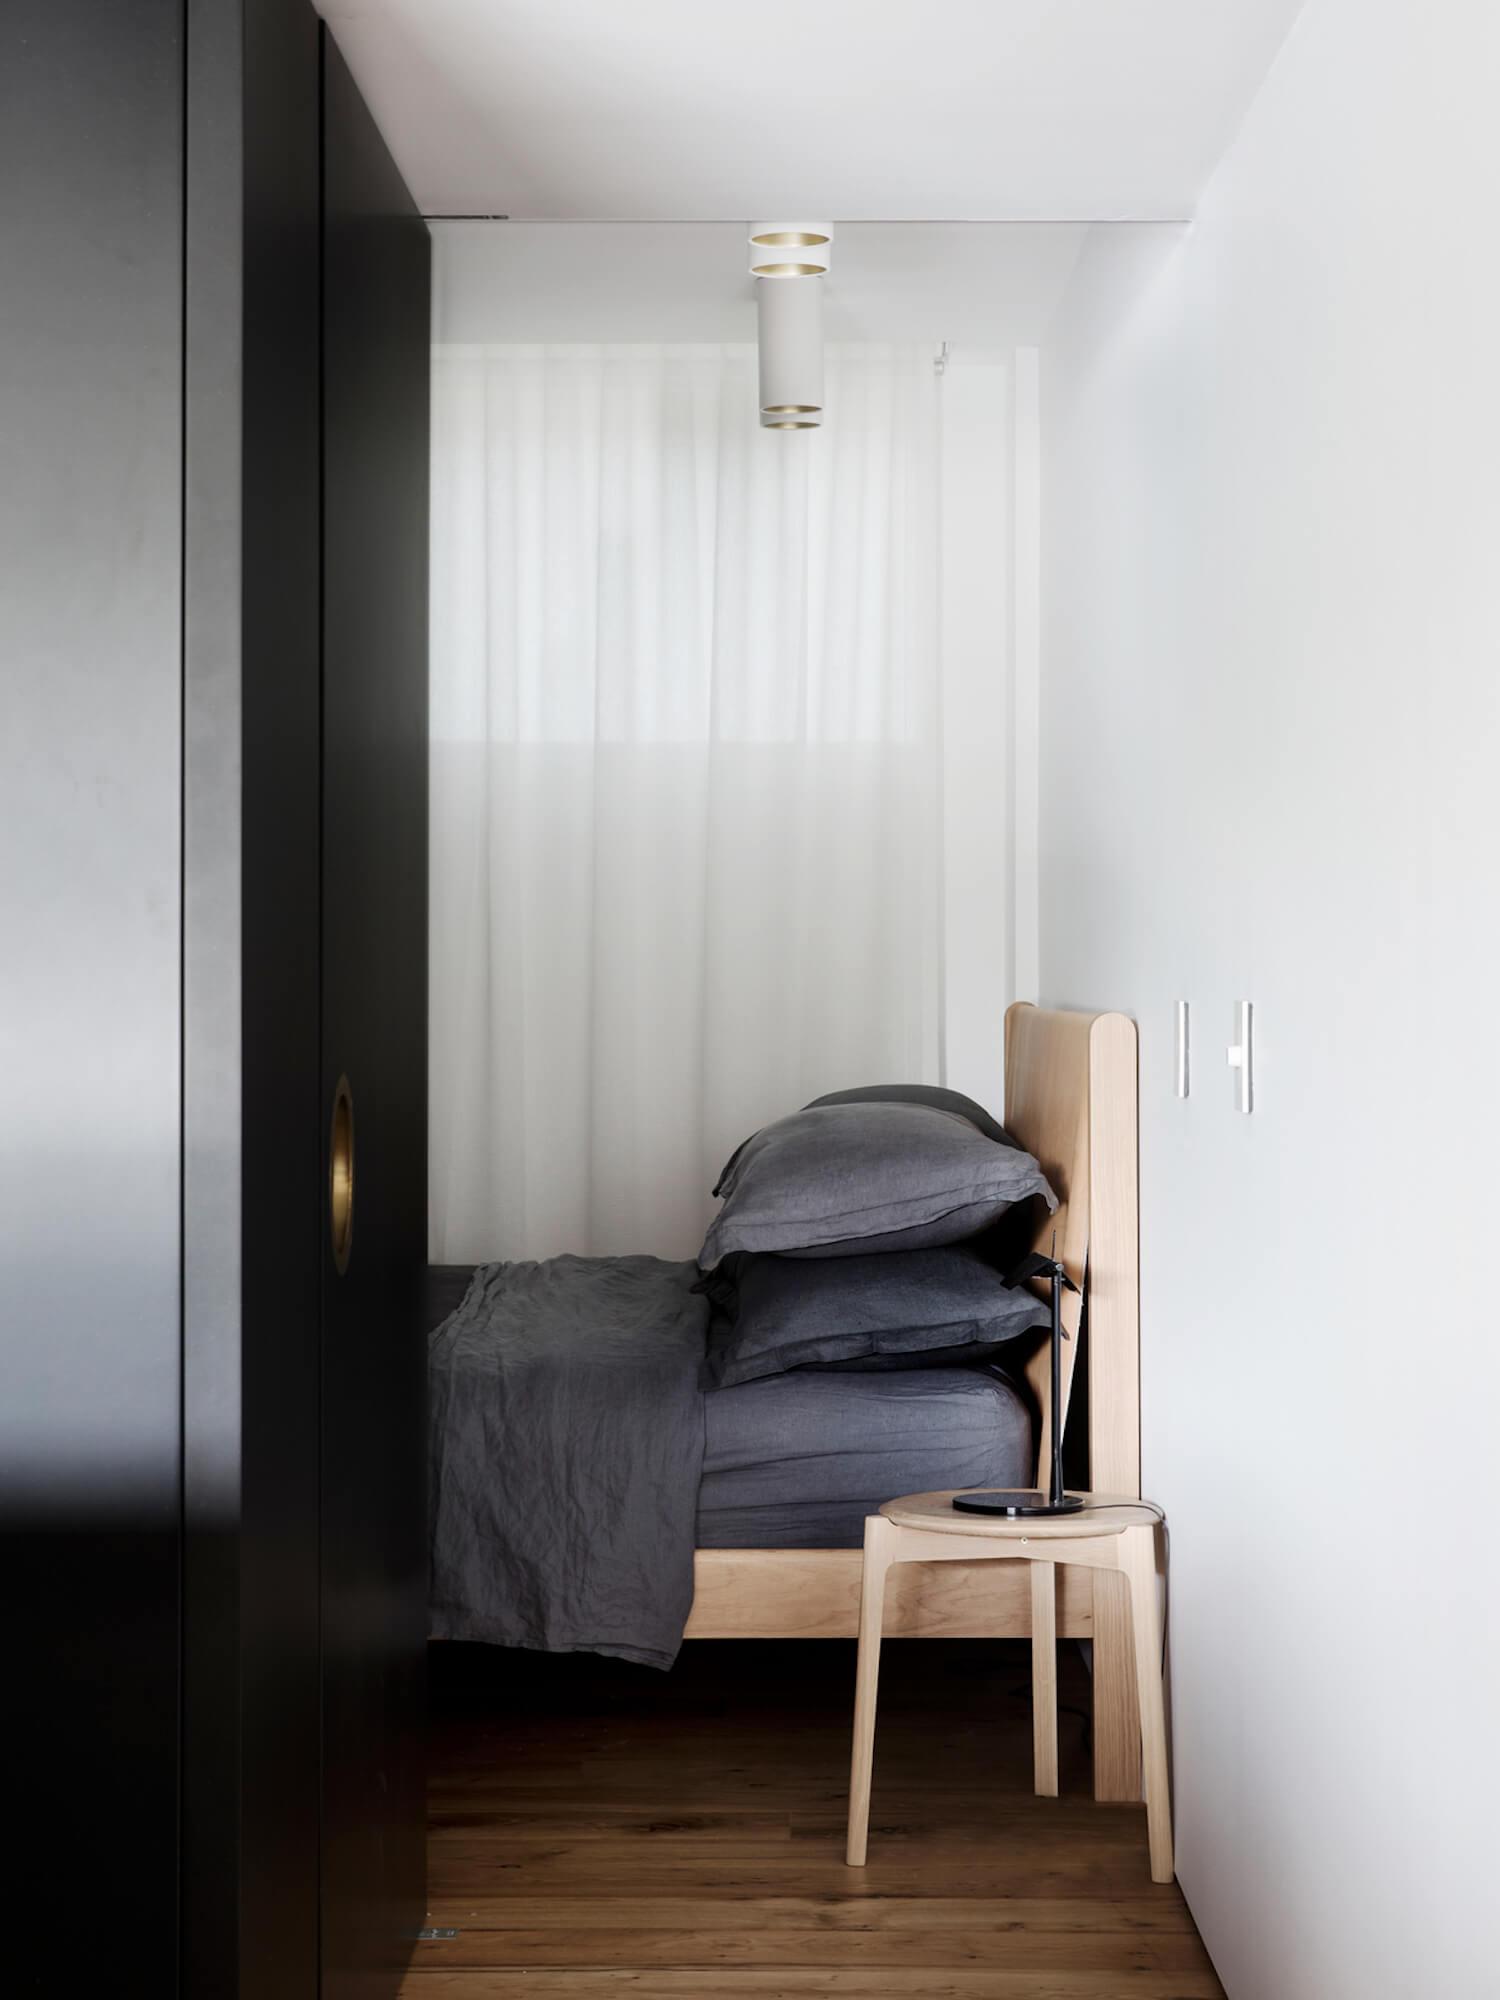 est living finger wharf apartment architecture prineas 4